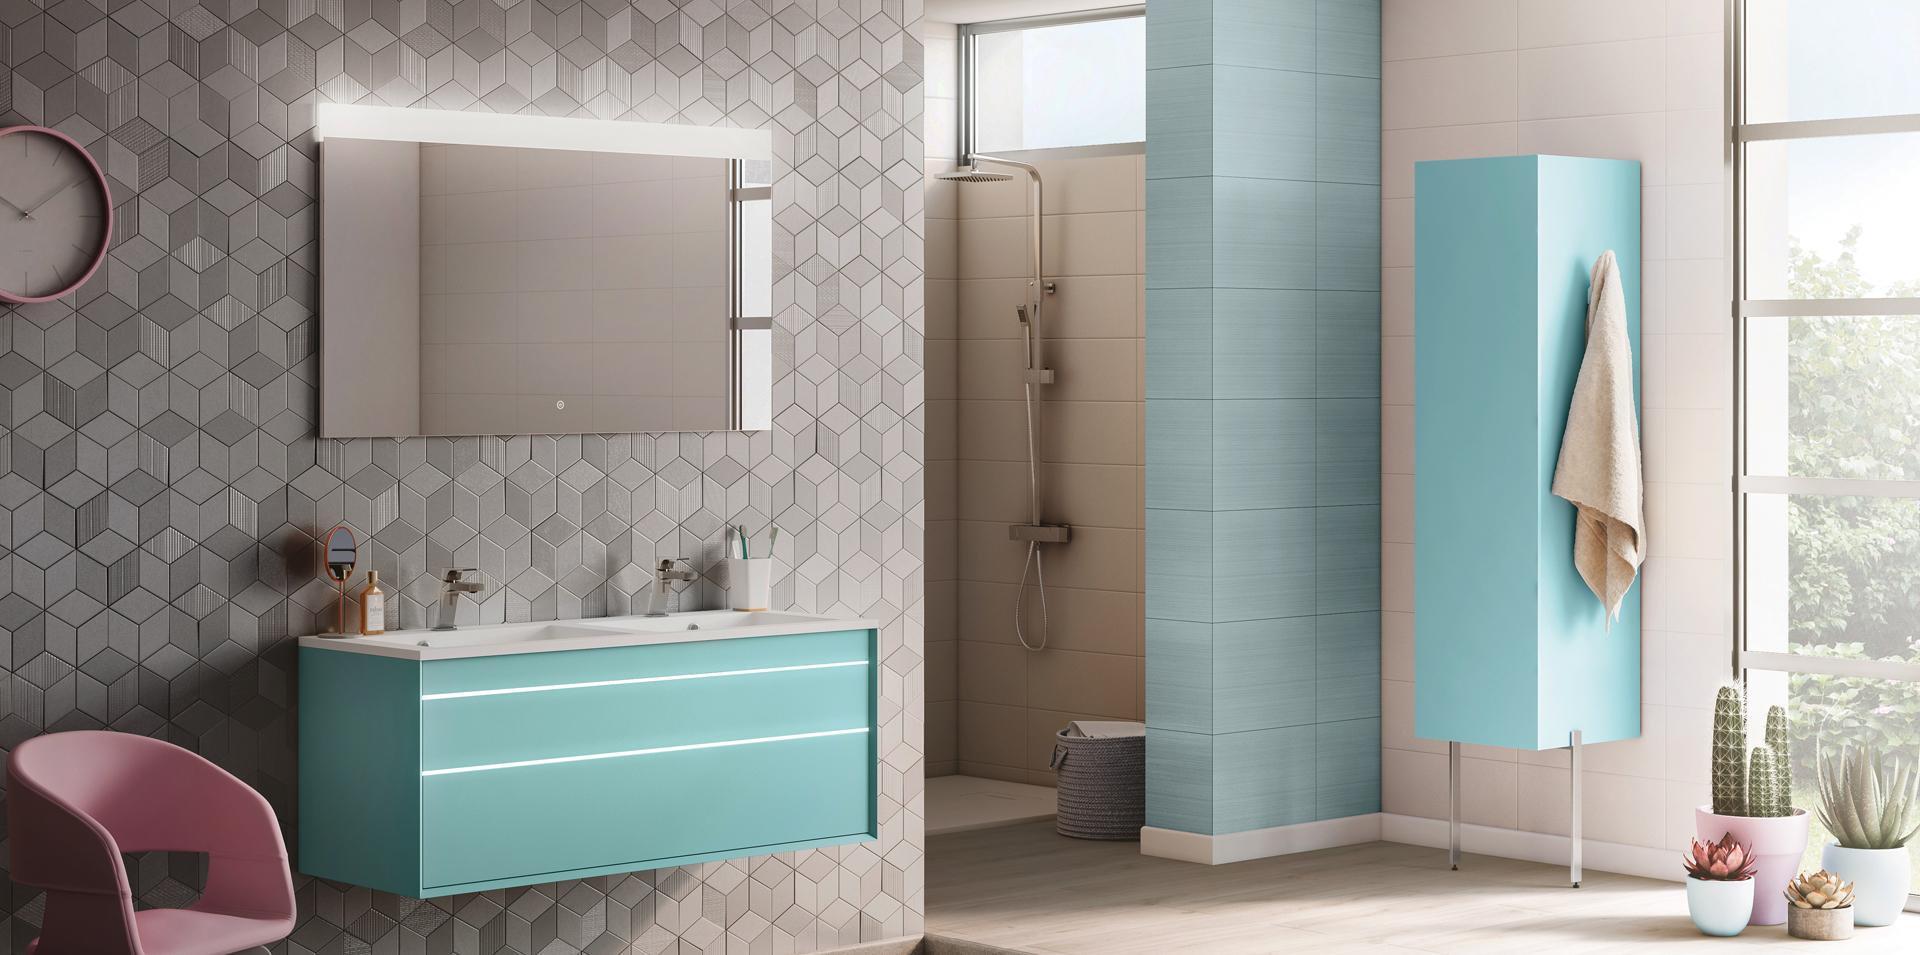 Meubles de salle de bain design  mobilier baignoires et